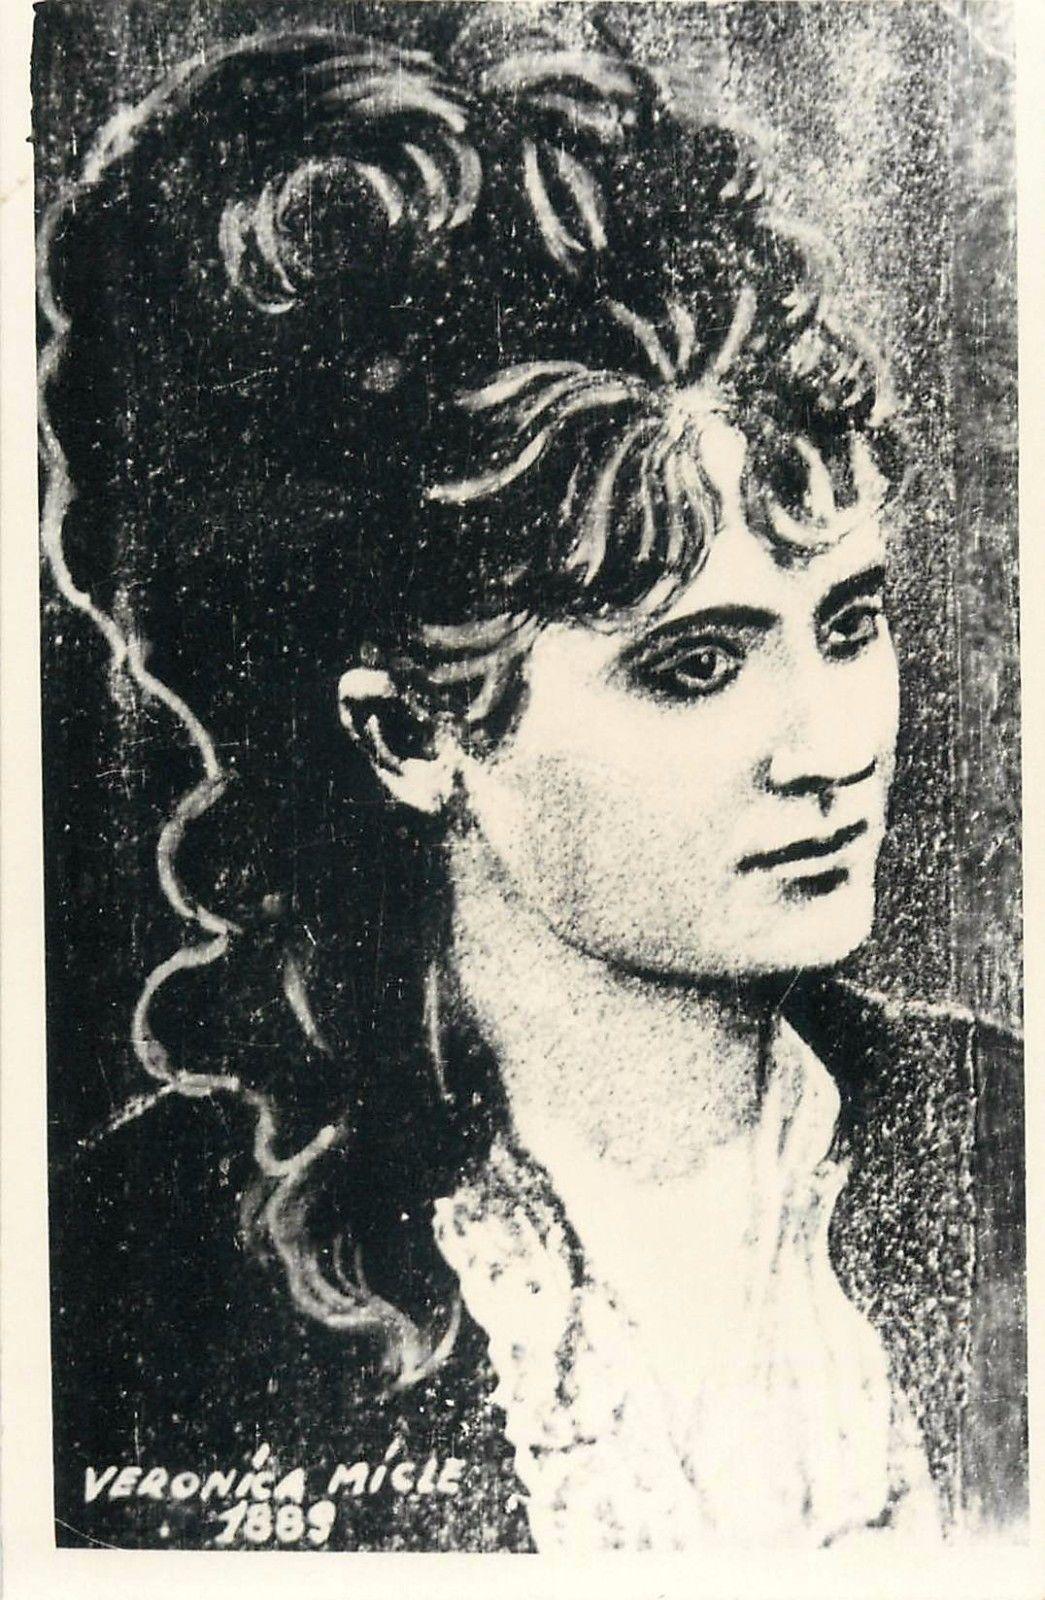 Veronica Micle biografie pe scurt